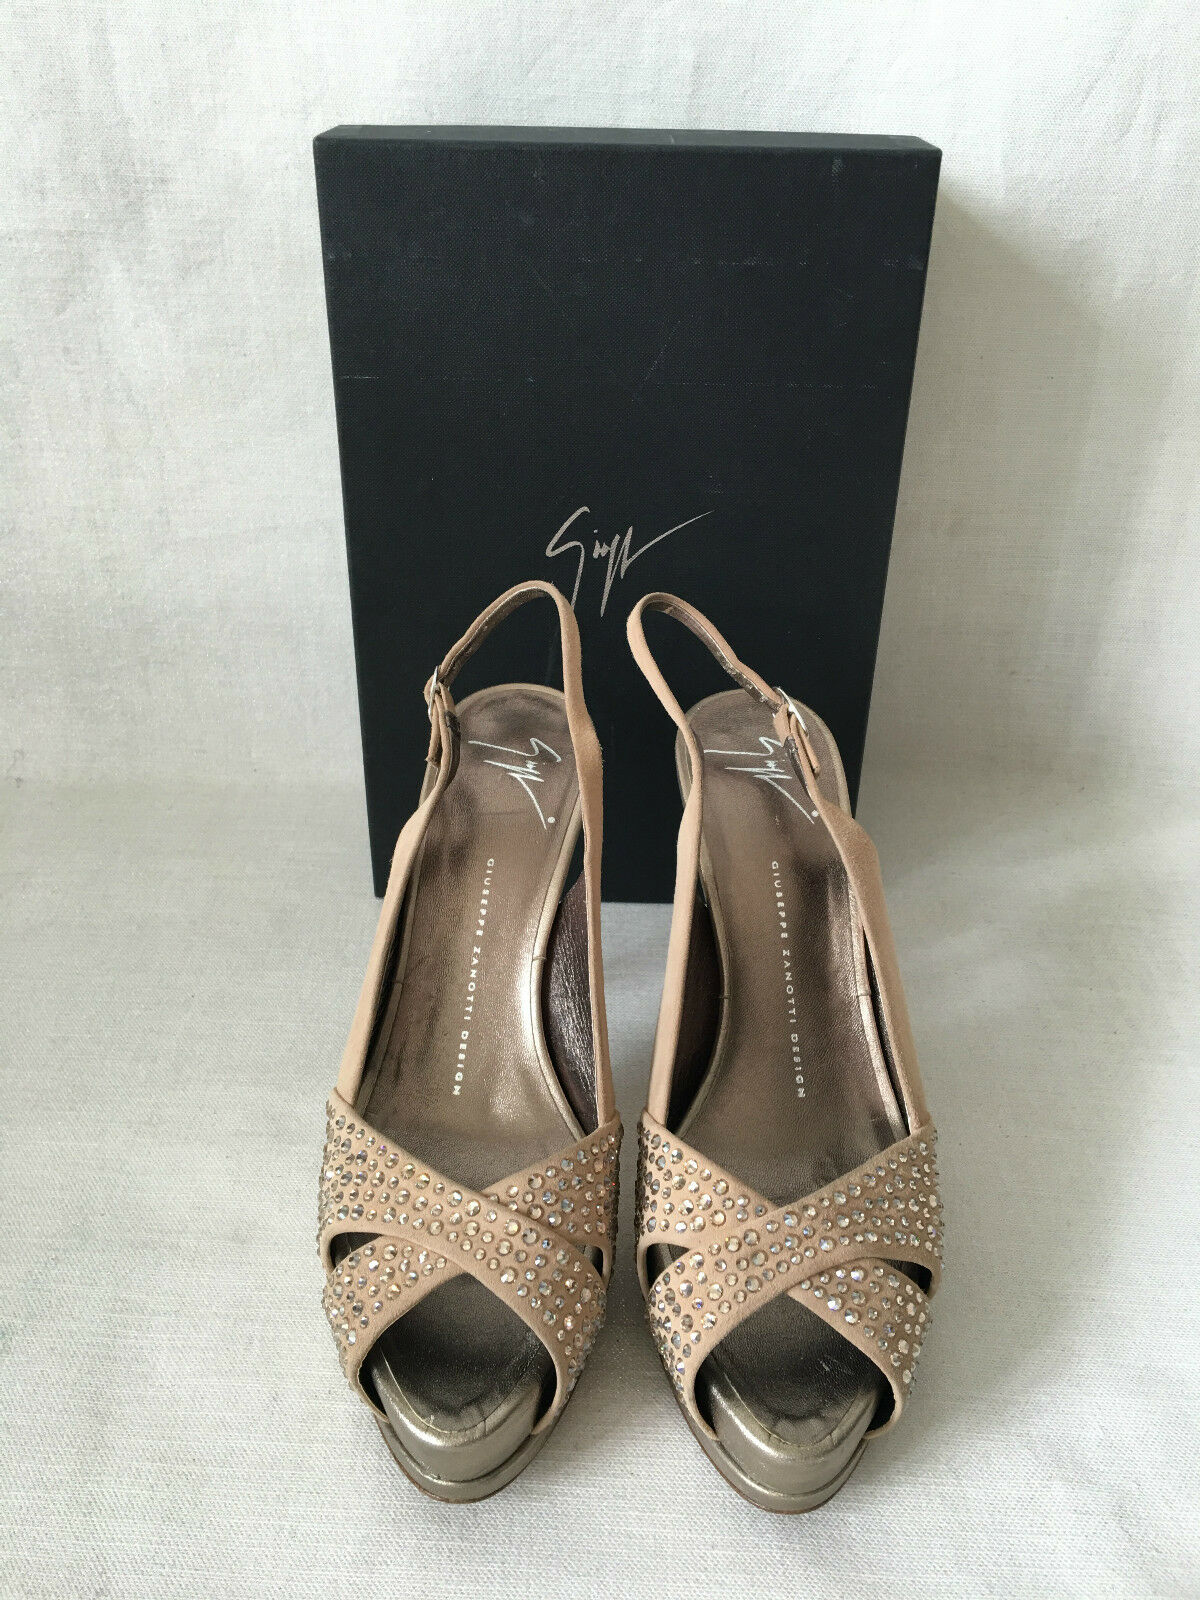 Giuseppe Zanotti Swarovski Crystal Rhinestone Studded Nude Suede Pumps shoes 39